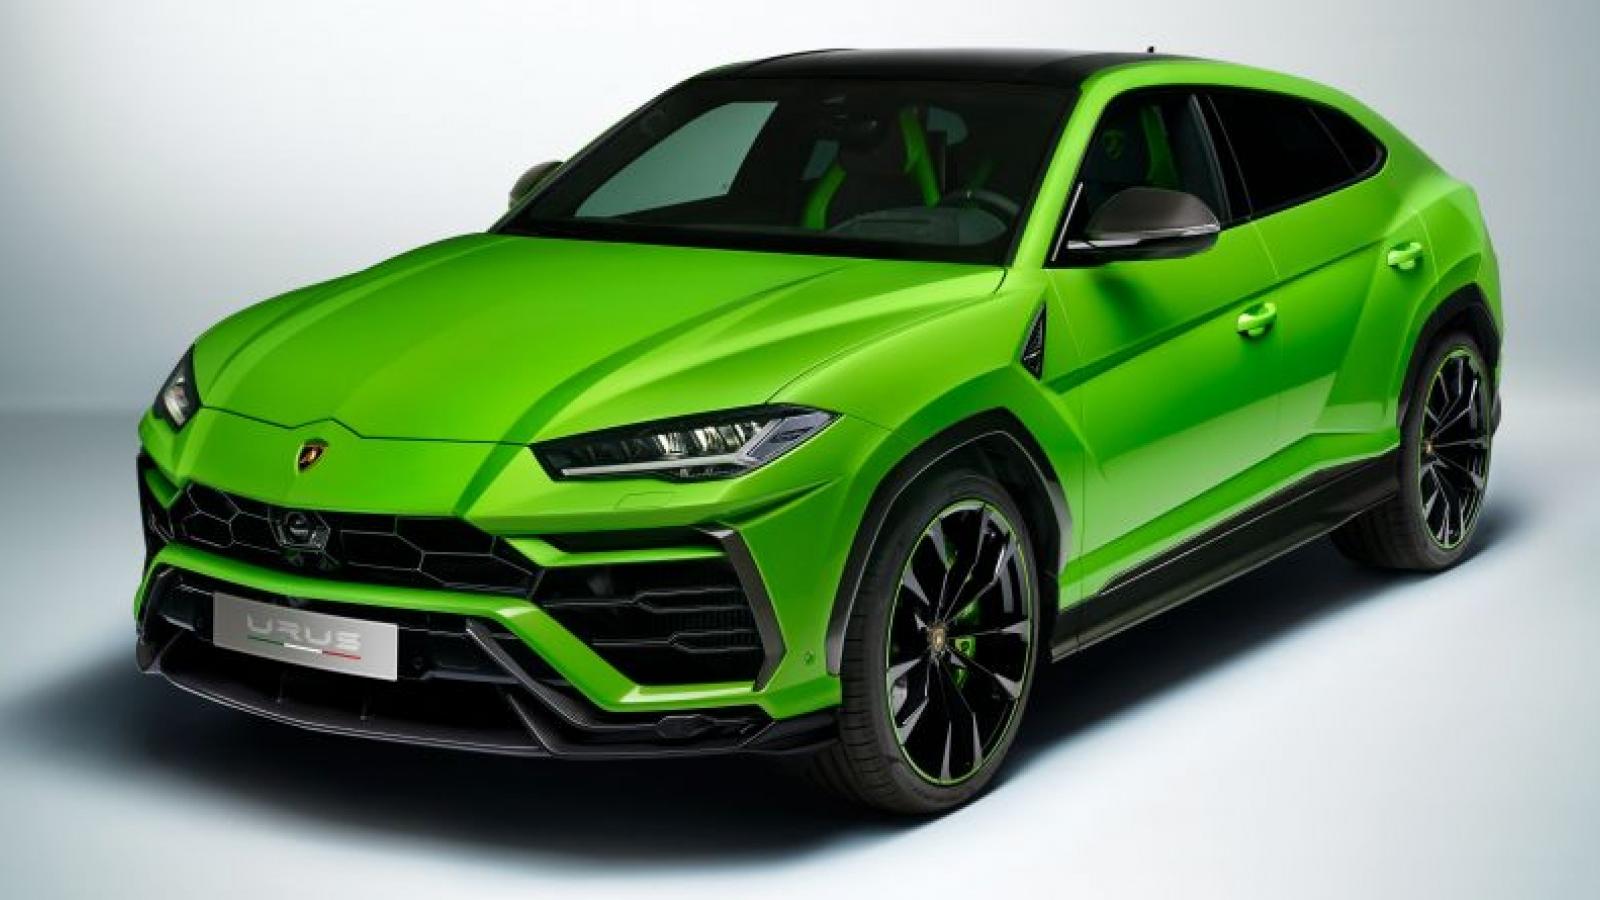 Siêu SUV Lamborghini Urus 2021 ra mắt phiên bản Pearl Capsule